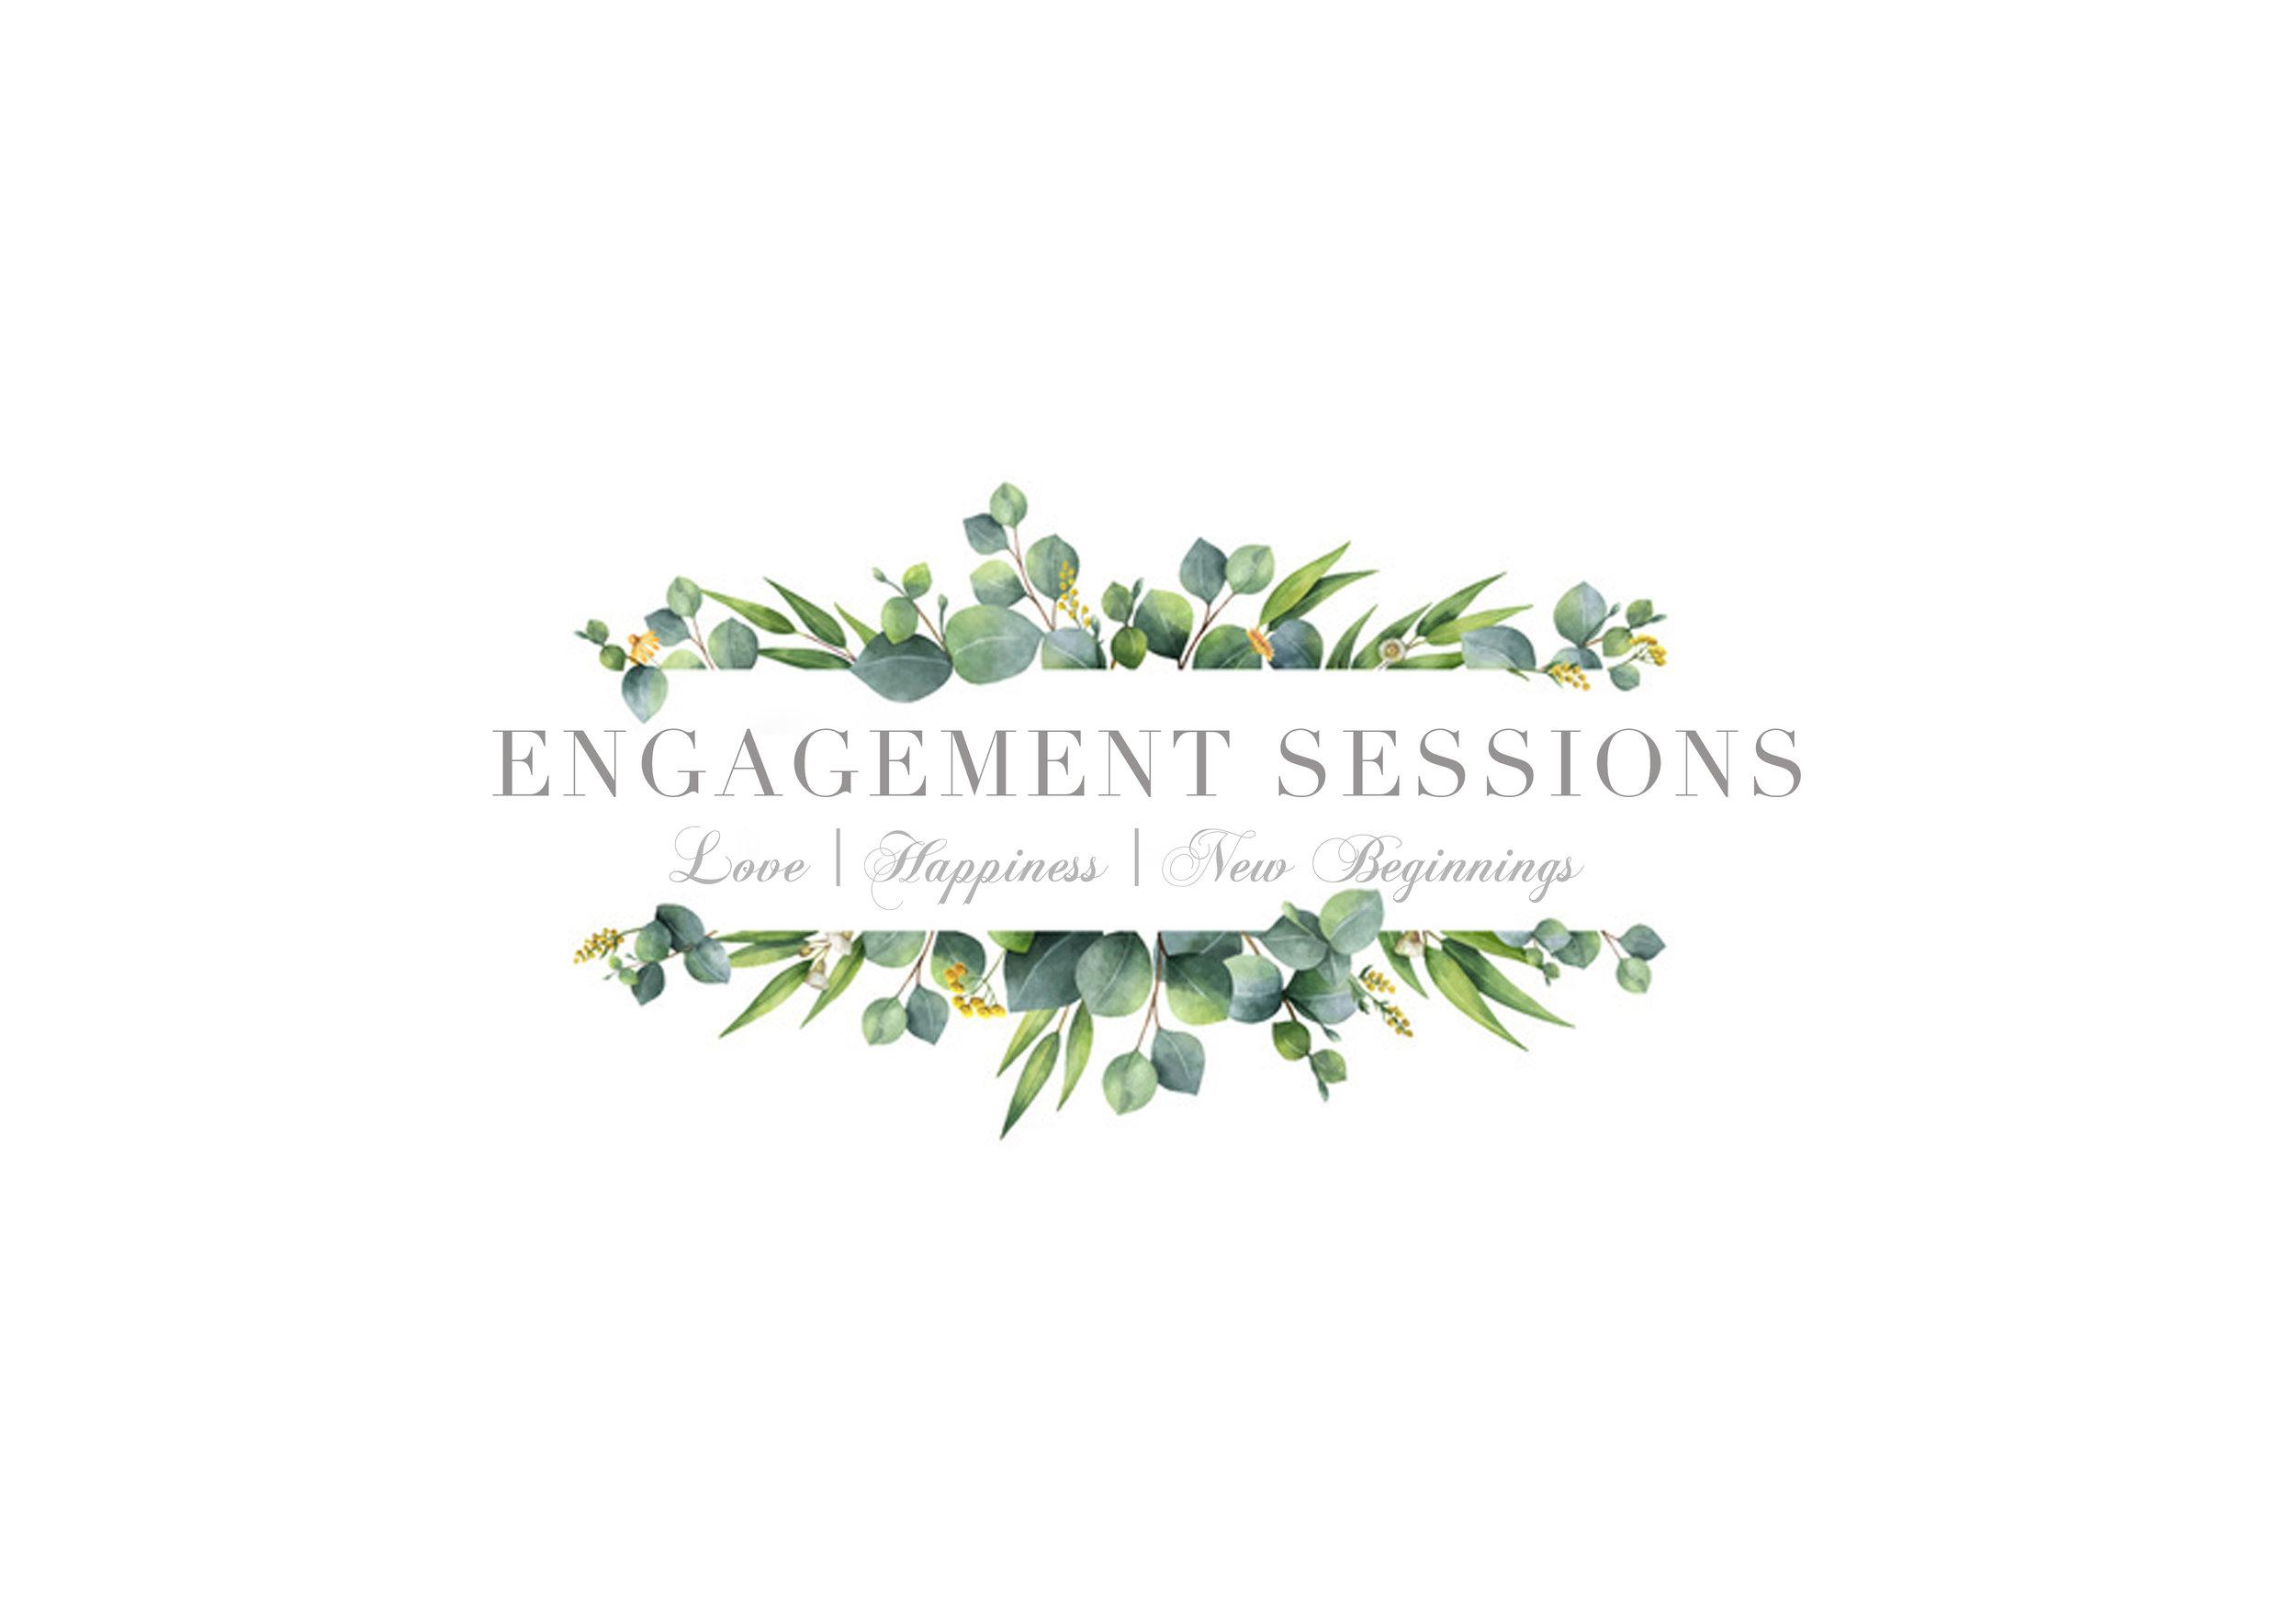 engagement session title.jpg